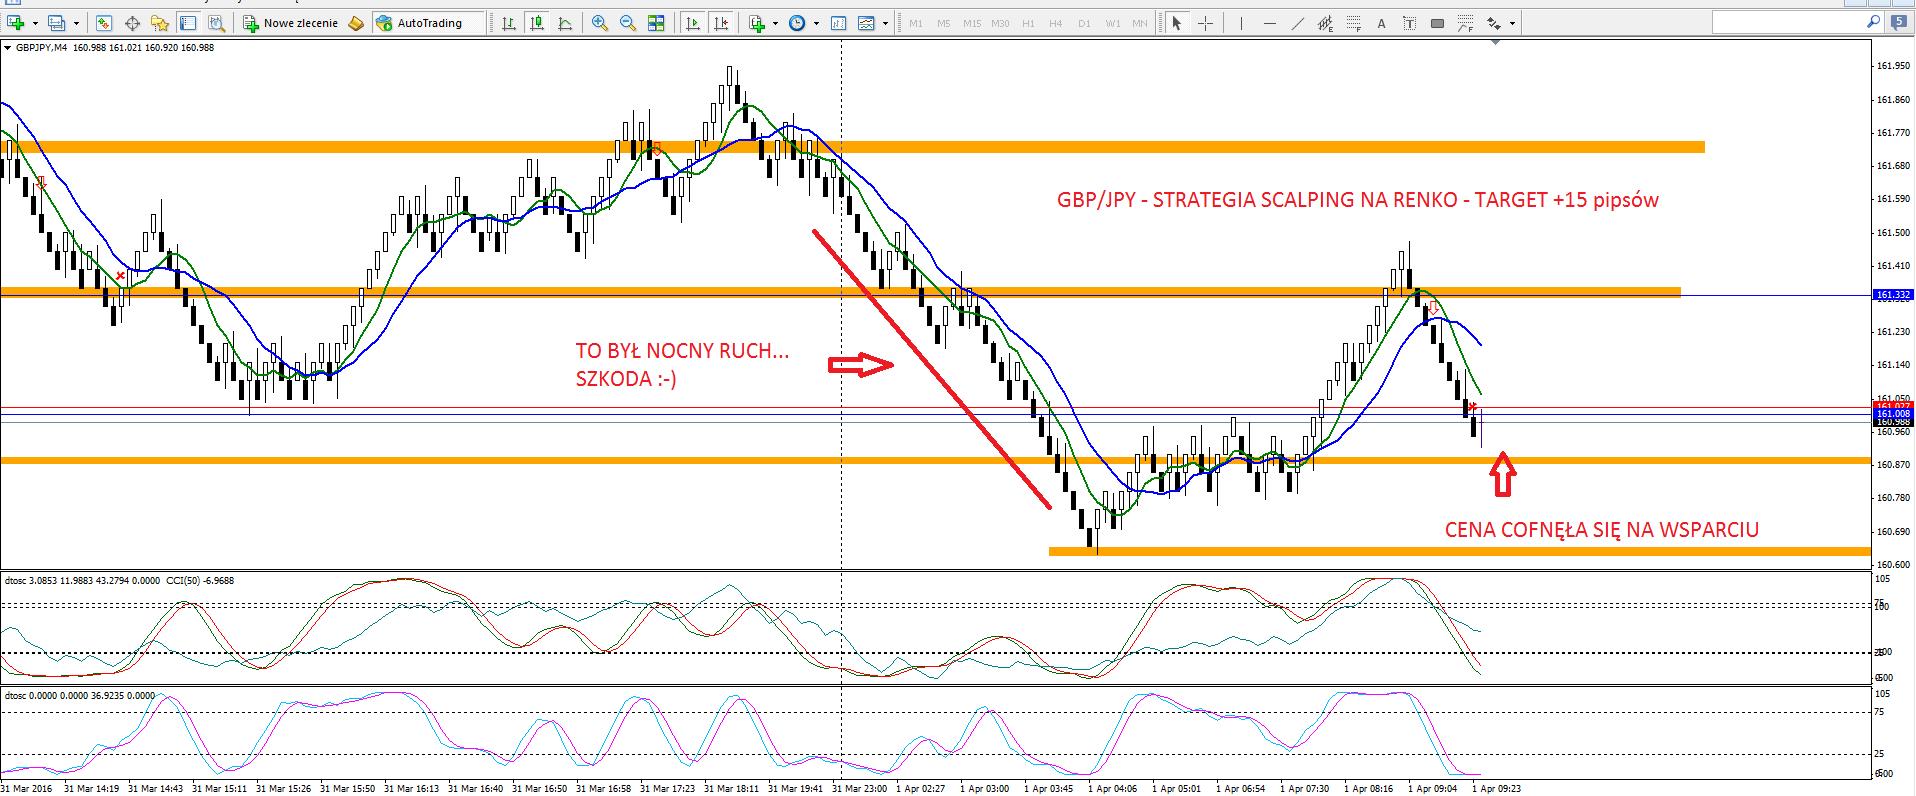 5--forex-scalping-skuteczna strategia na forex-renko-scalping na renko-trading-trader-dax-waluty